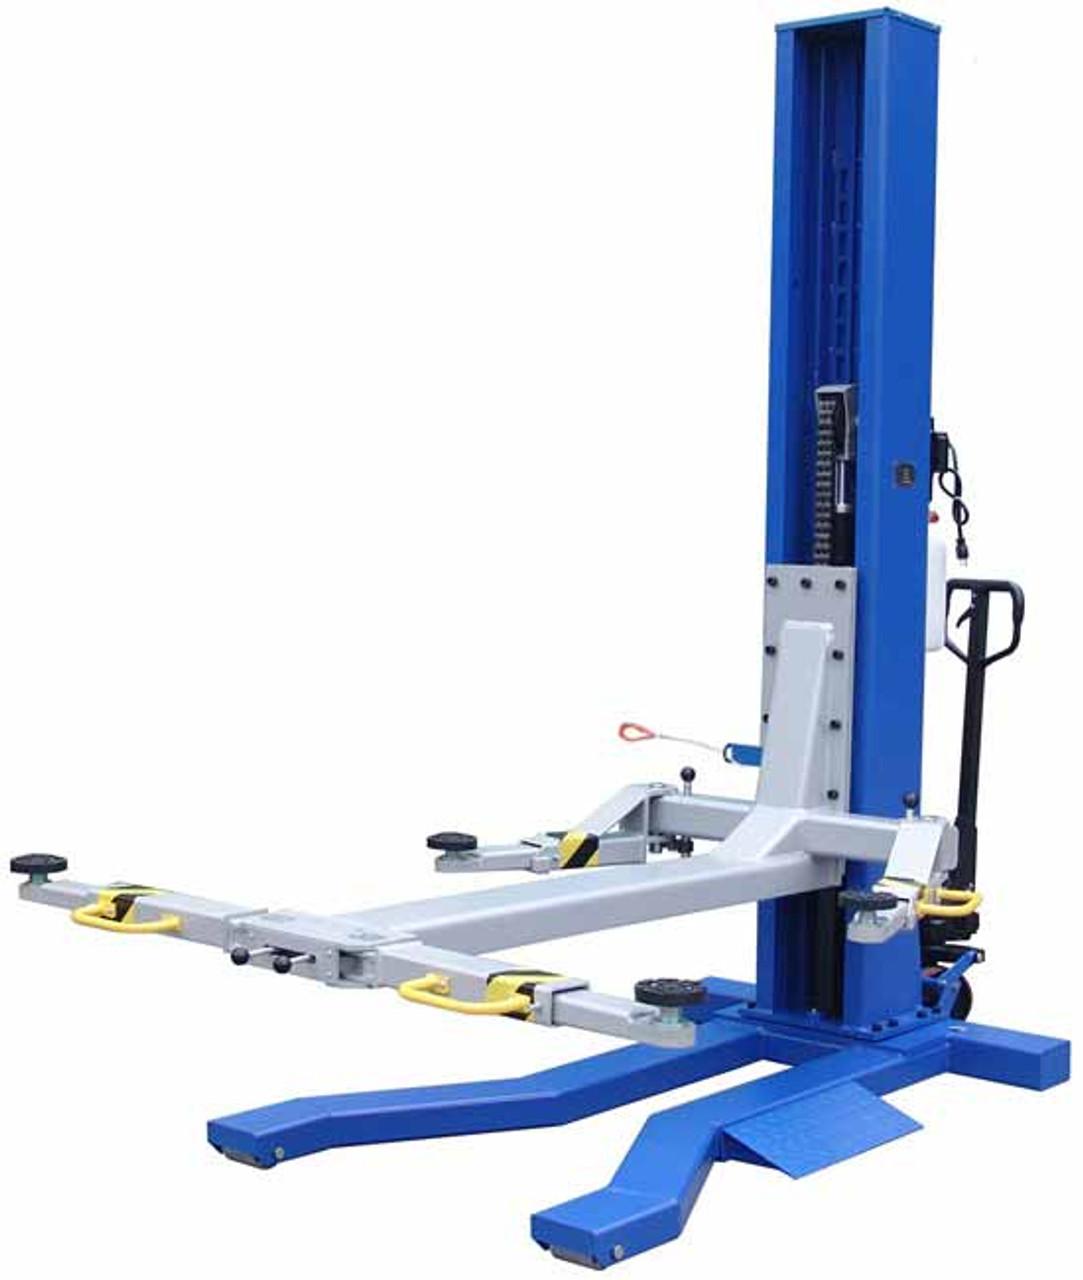 Ideal MSC-6KLP 6,000 lb Mobile Single Column Lift | Low Profile